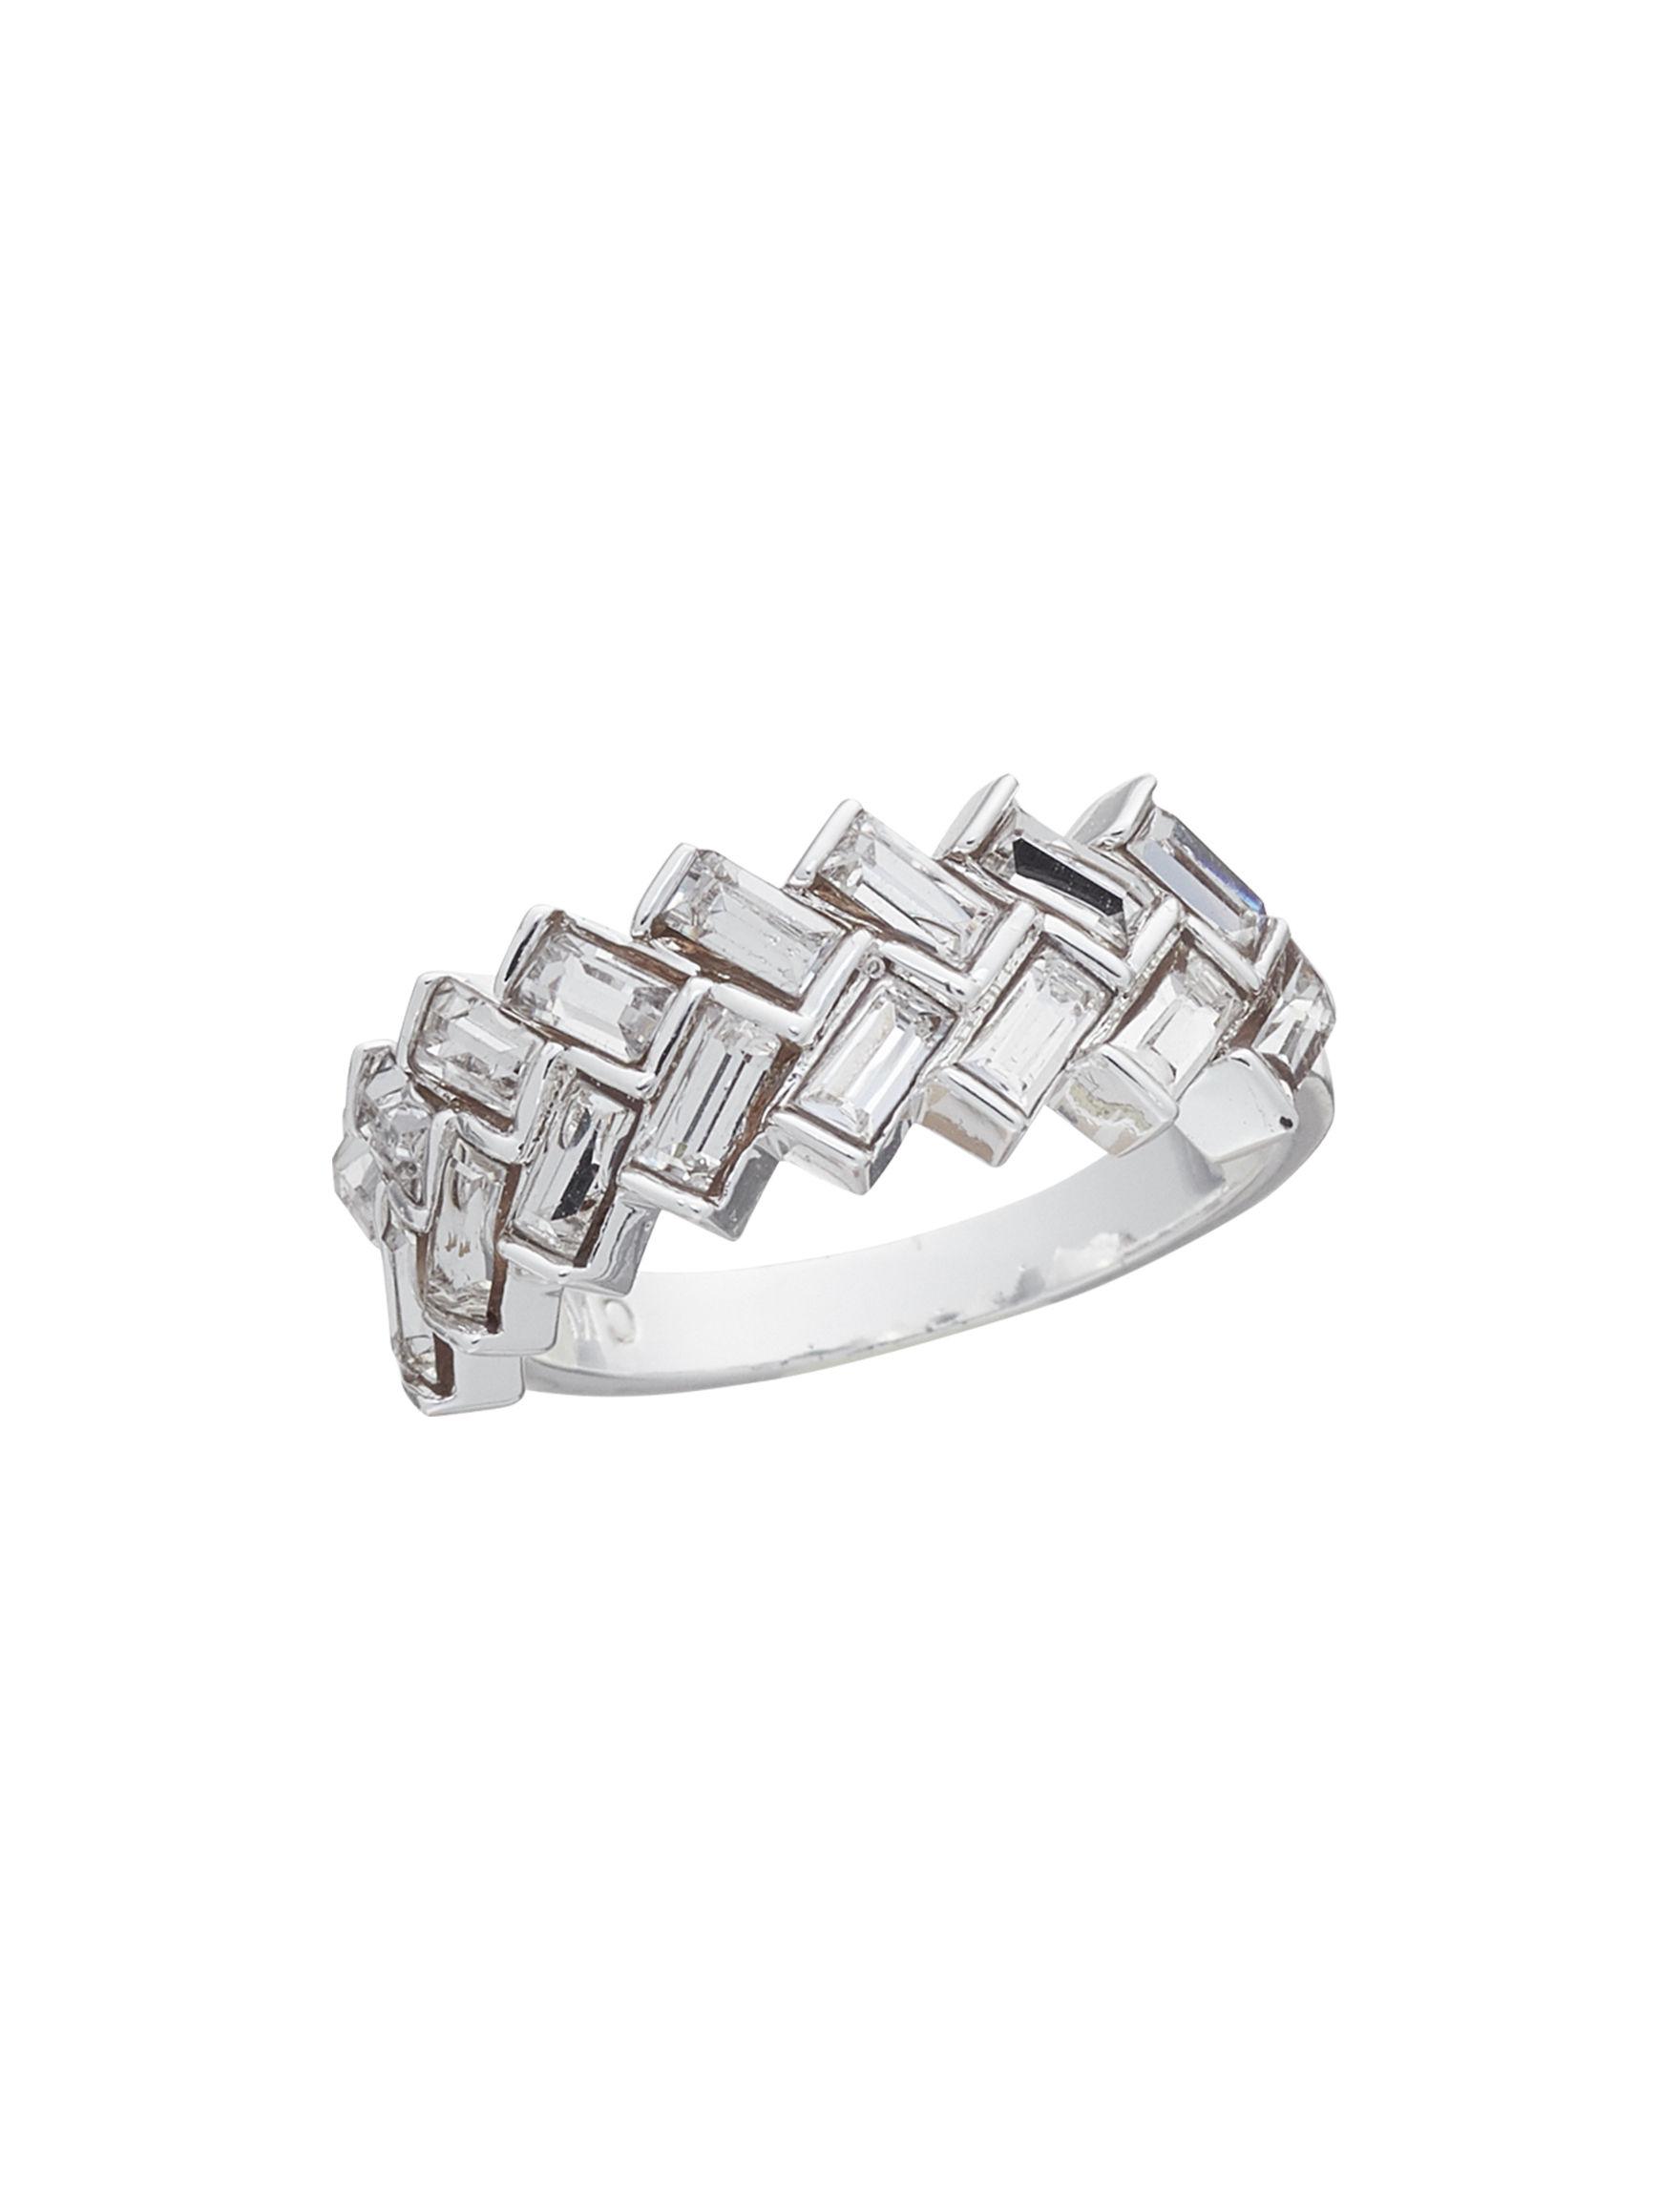 Marsala Silver / Crystal Rings Fine Jewelry